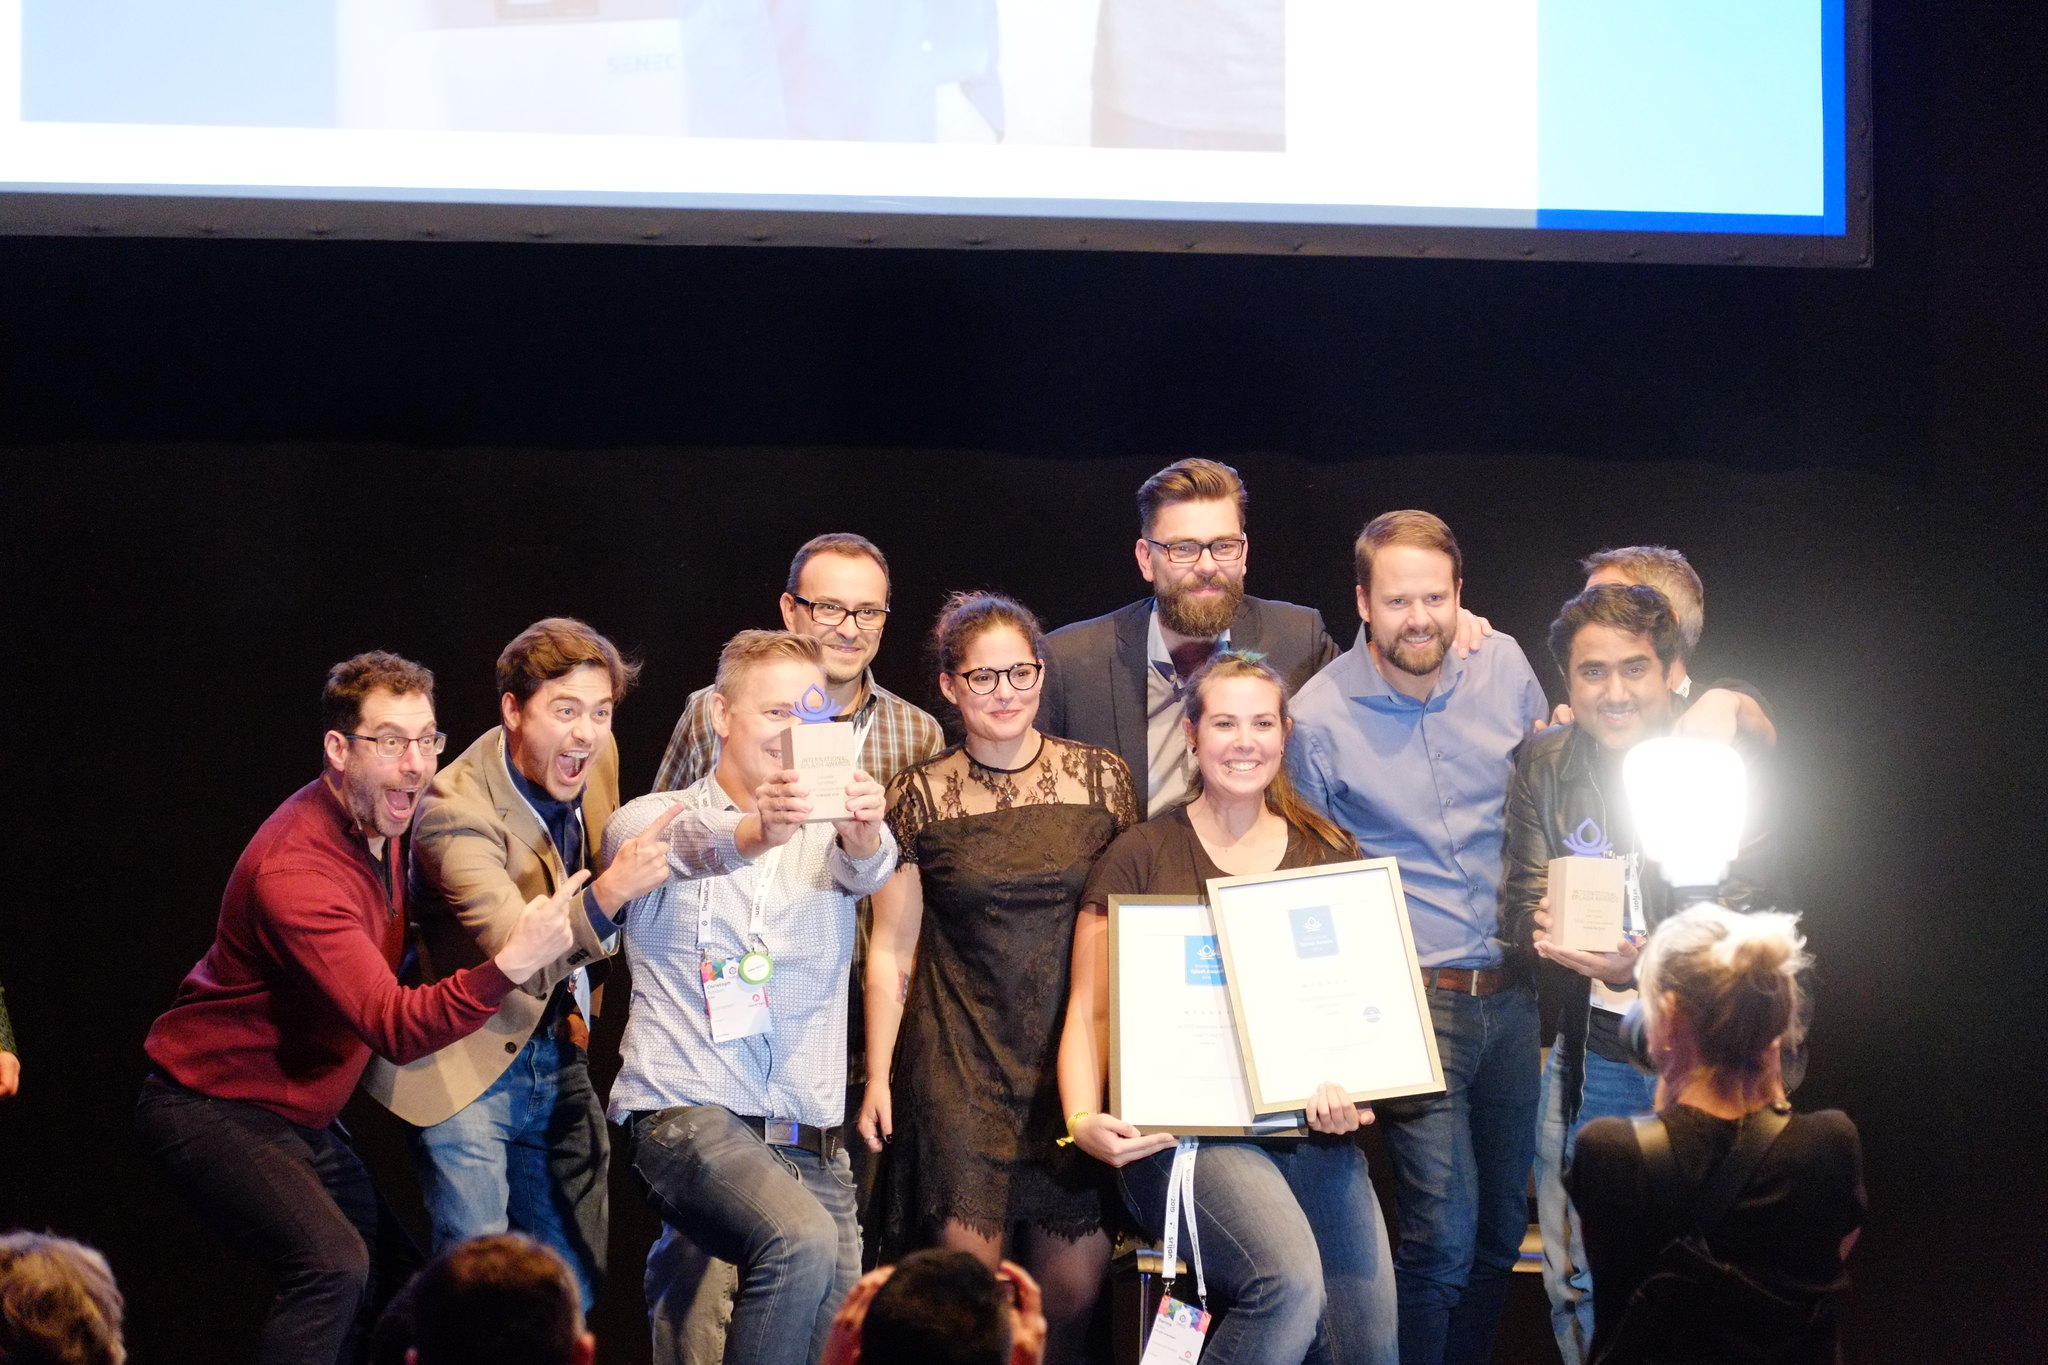 DrupalCon Amsterdam 2019